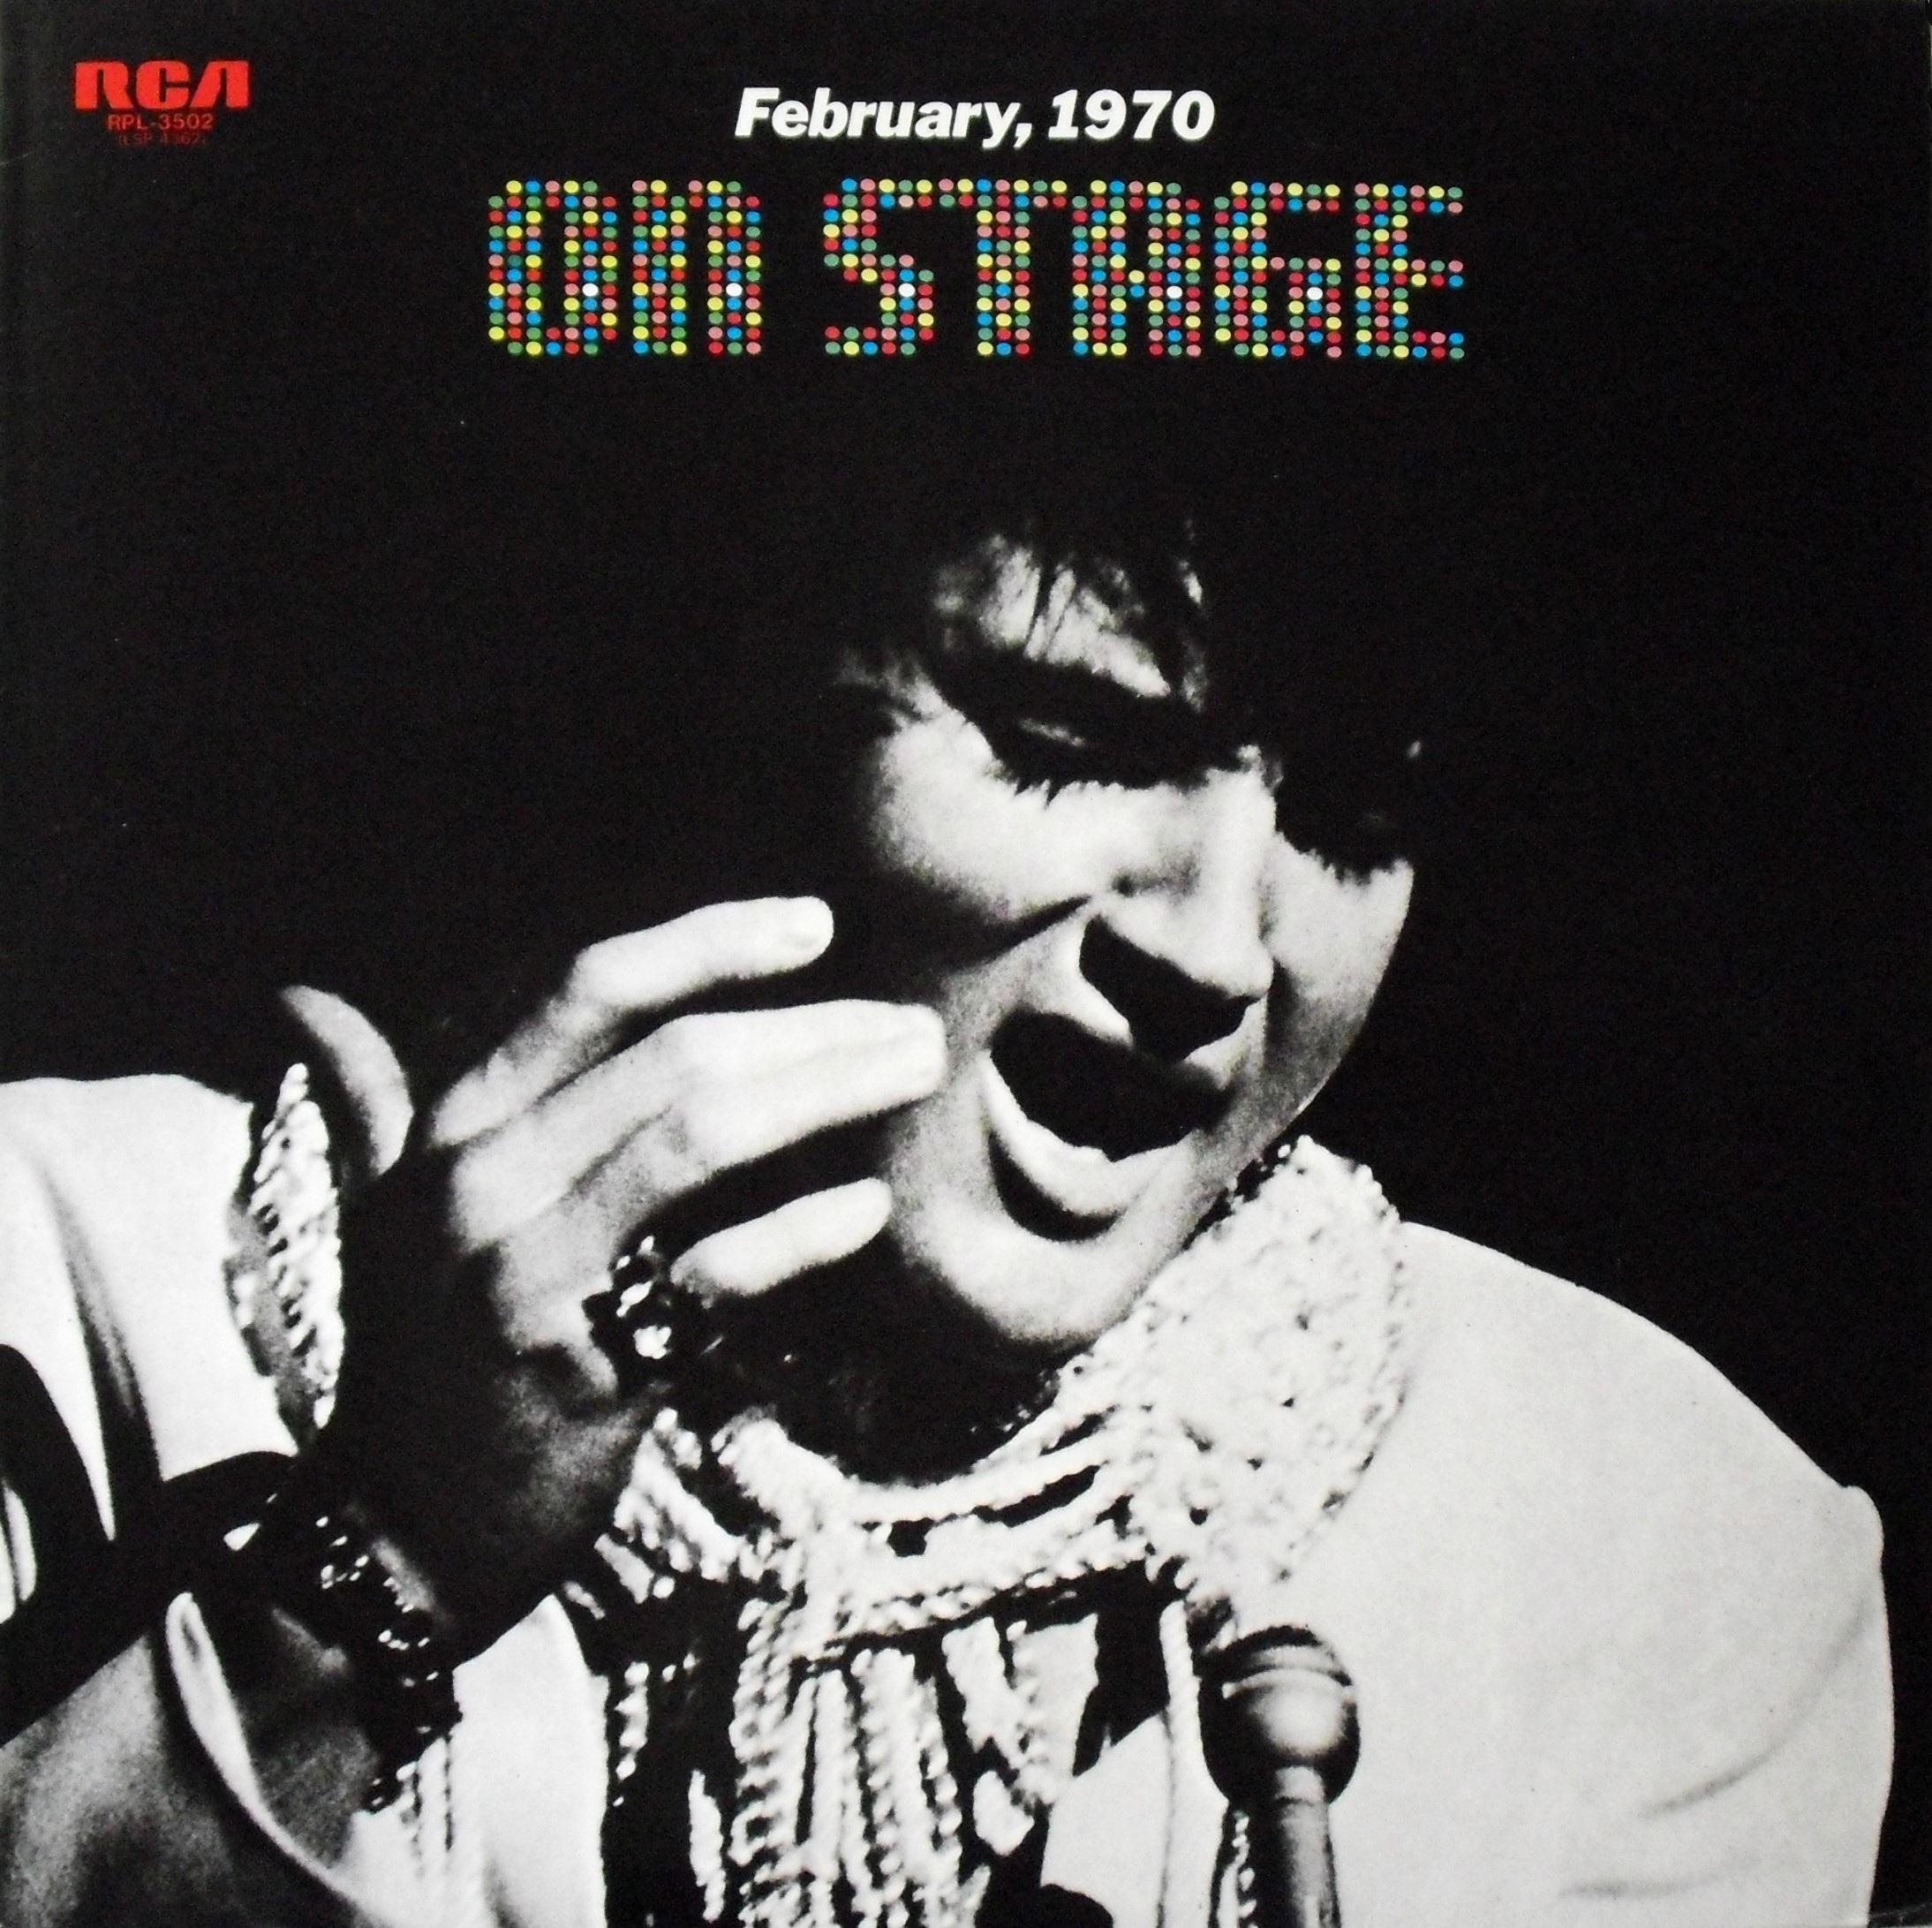 ON STAGE - FEBRUARY 1970 0129u3v